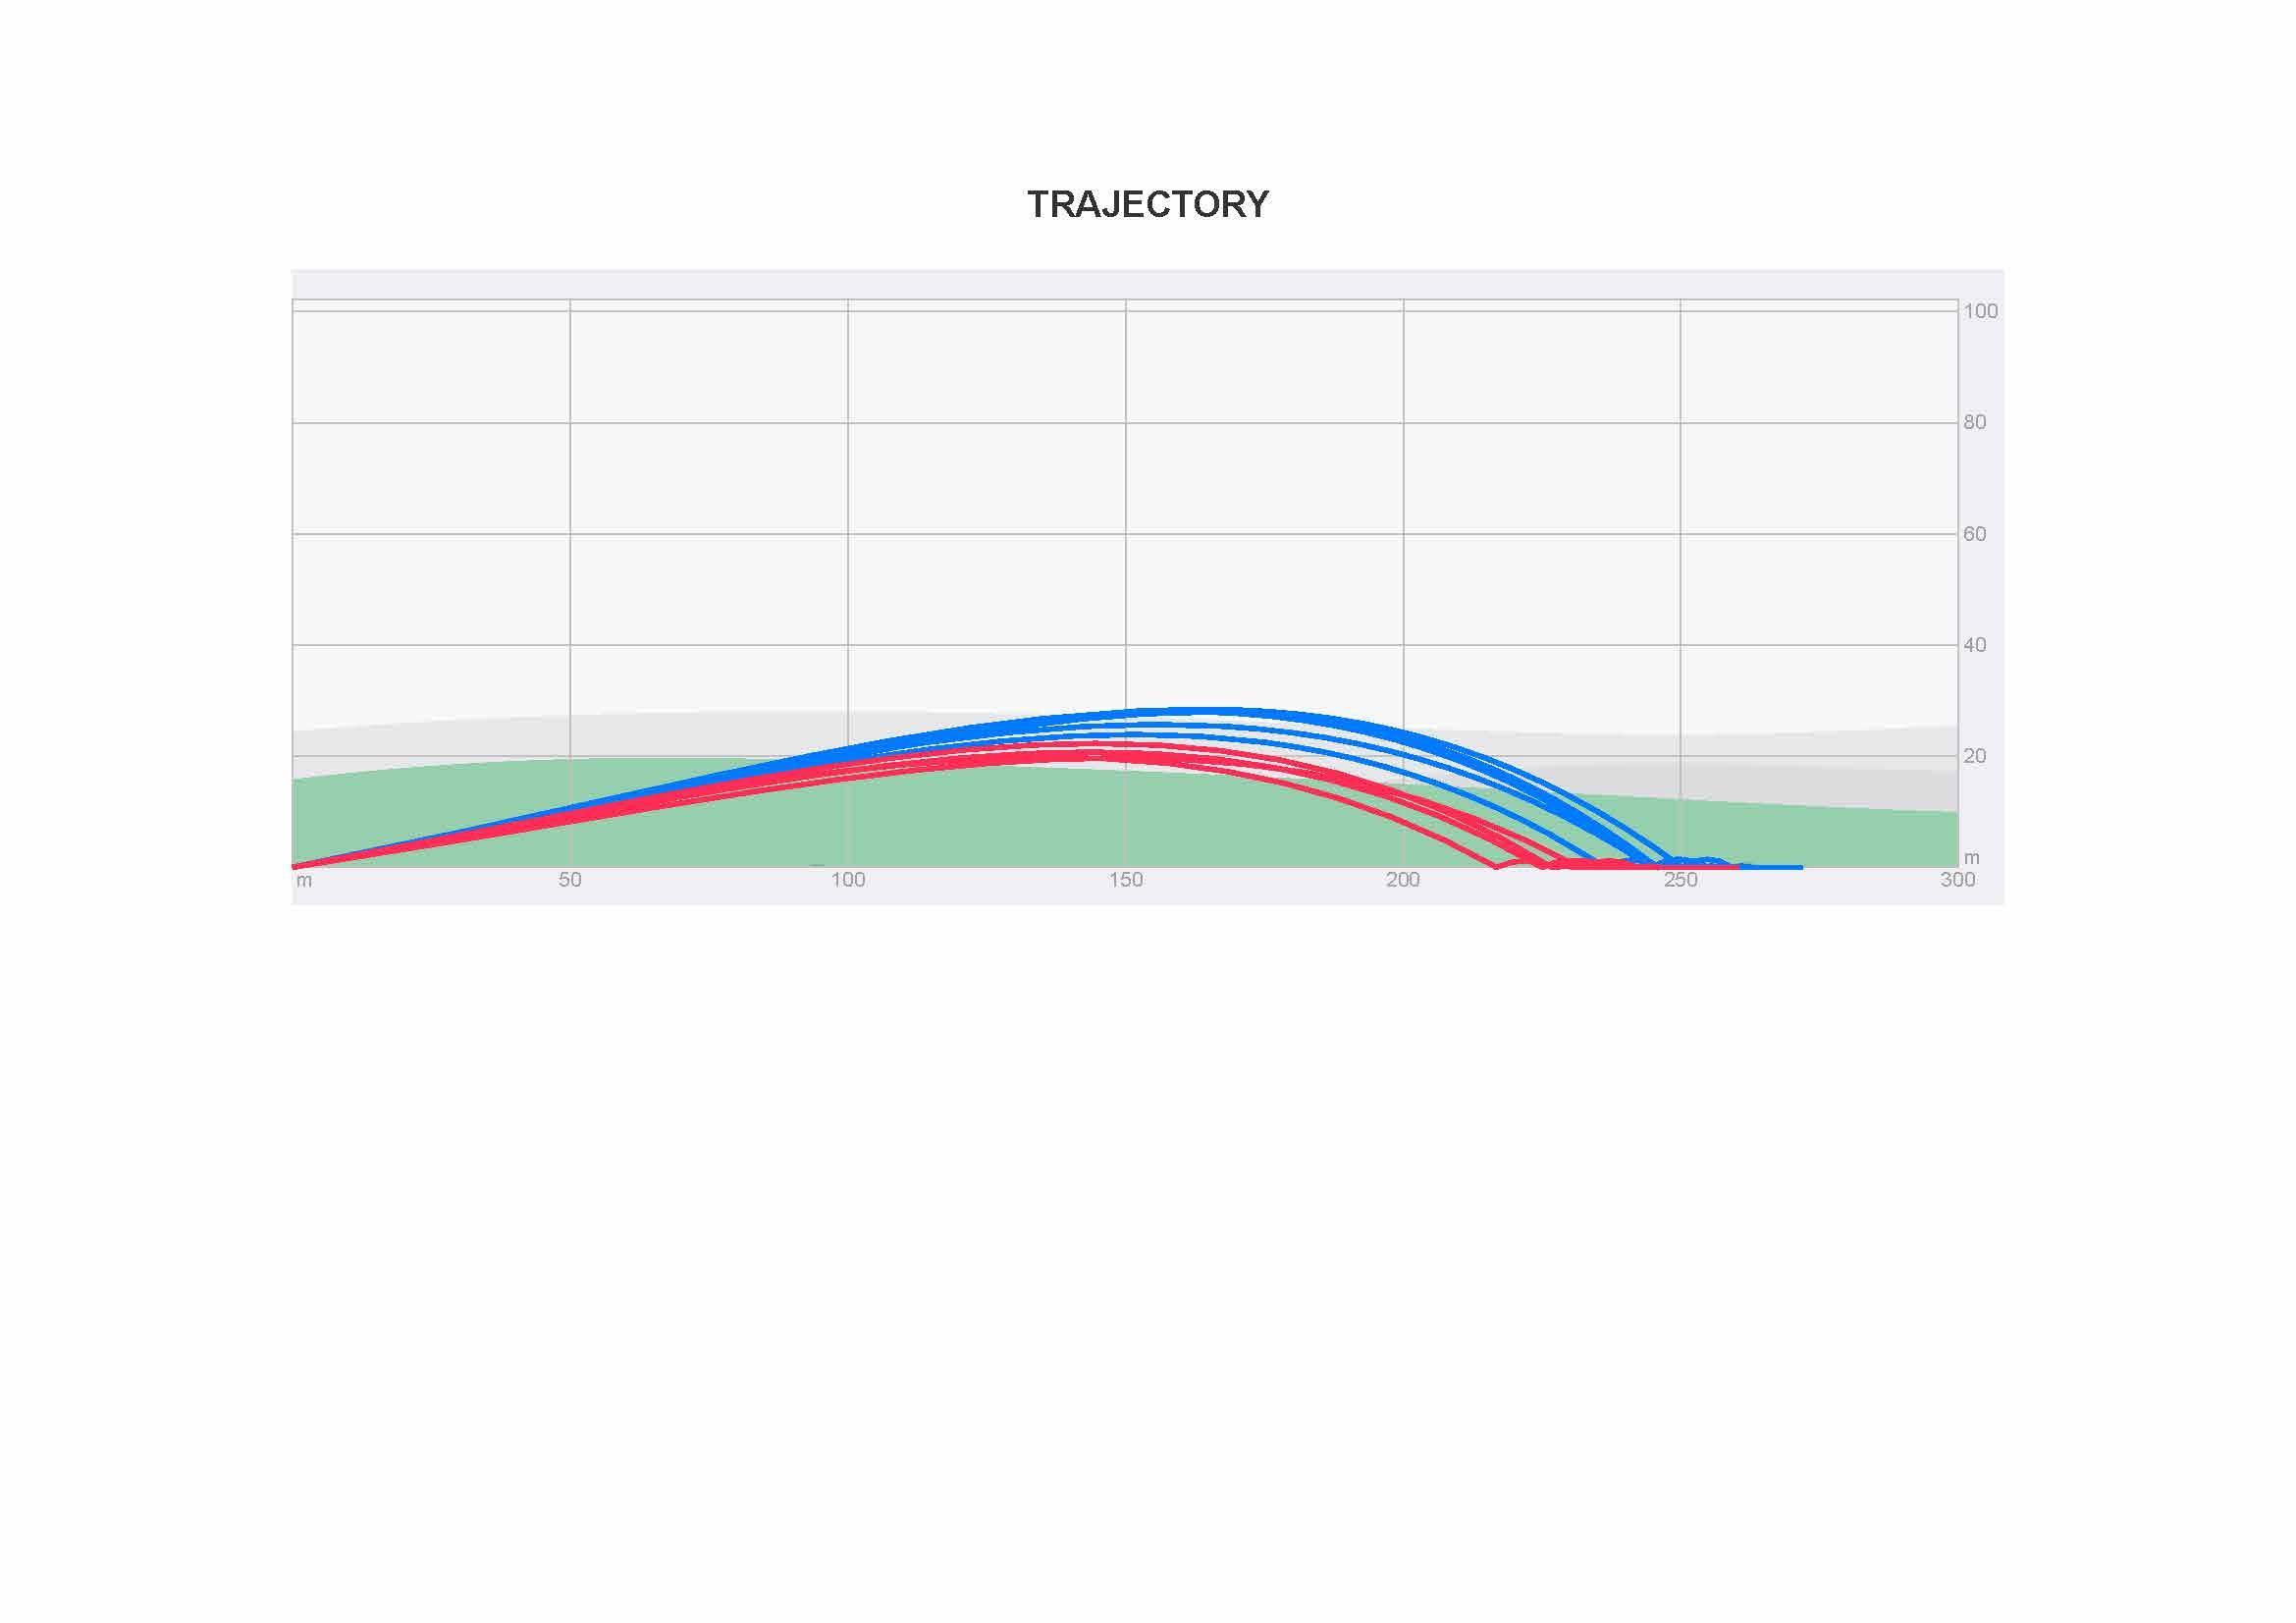 Trackman performance report